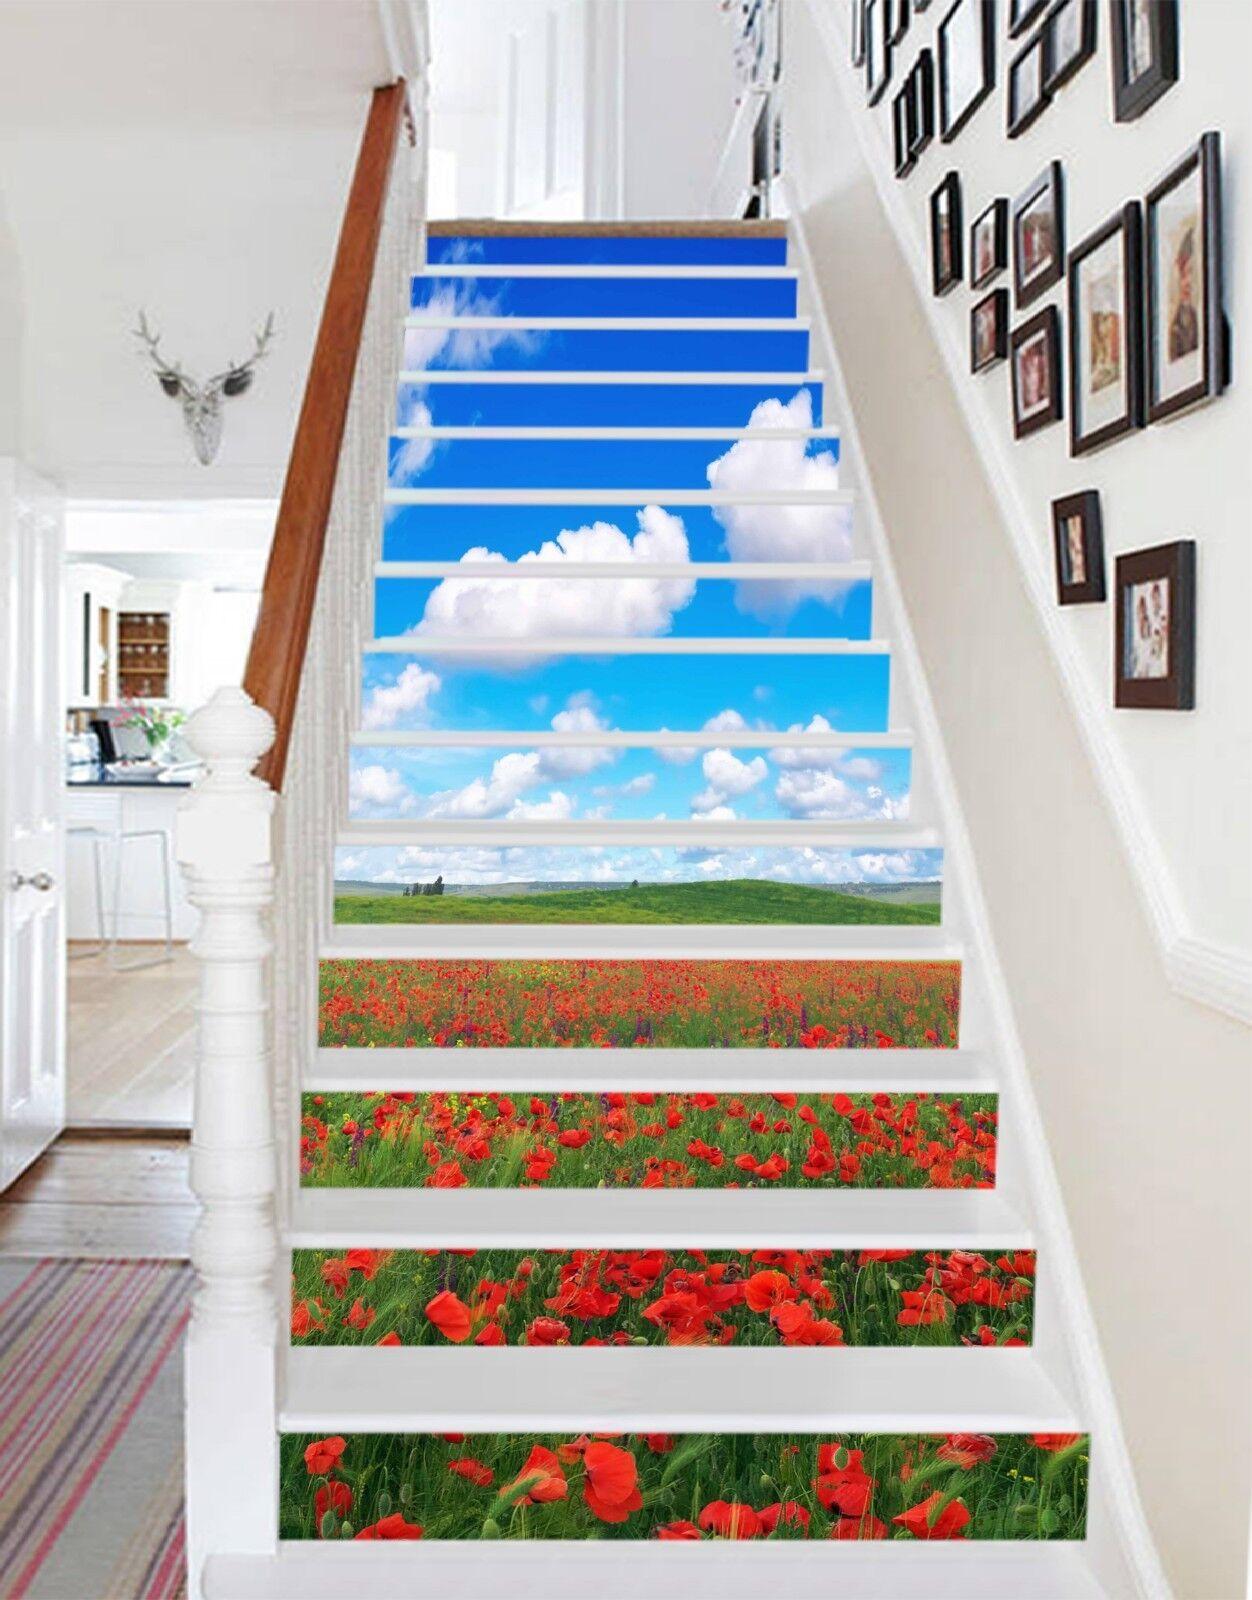 3D Üppige Blaumen 17 Stair Risers Dekoration Fototapete Vinyl Aufkleber Tapete DE